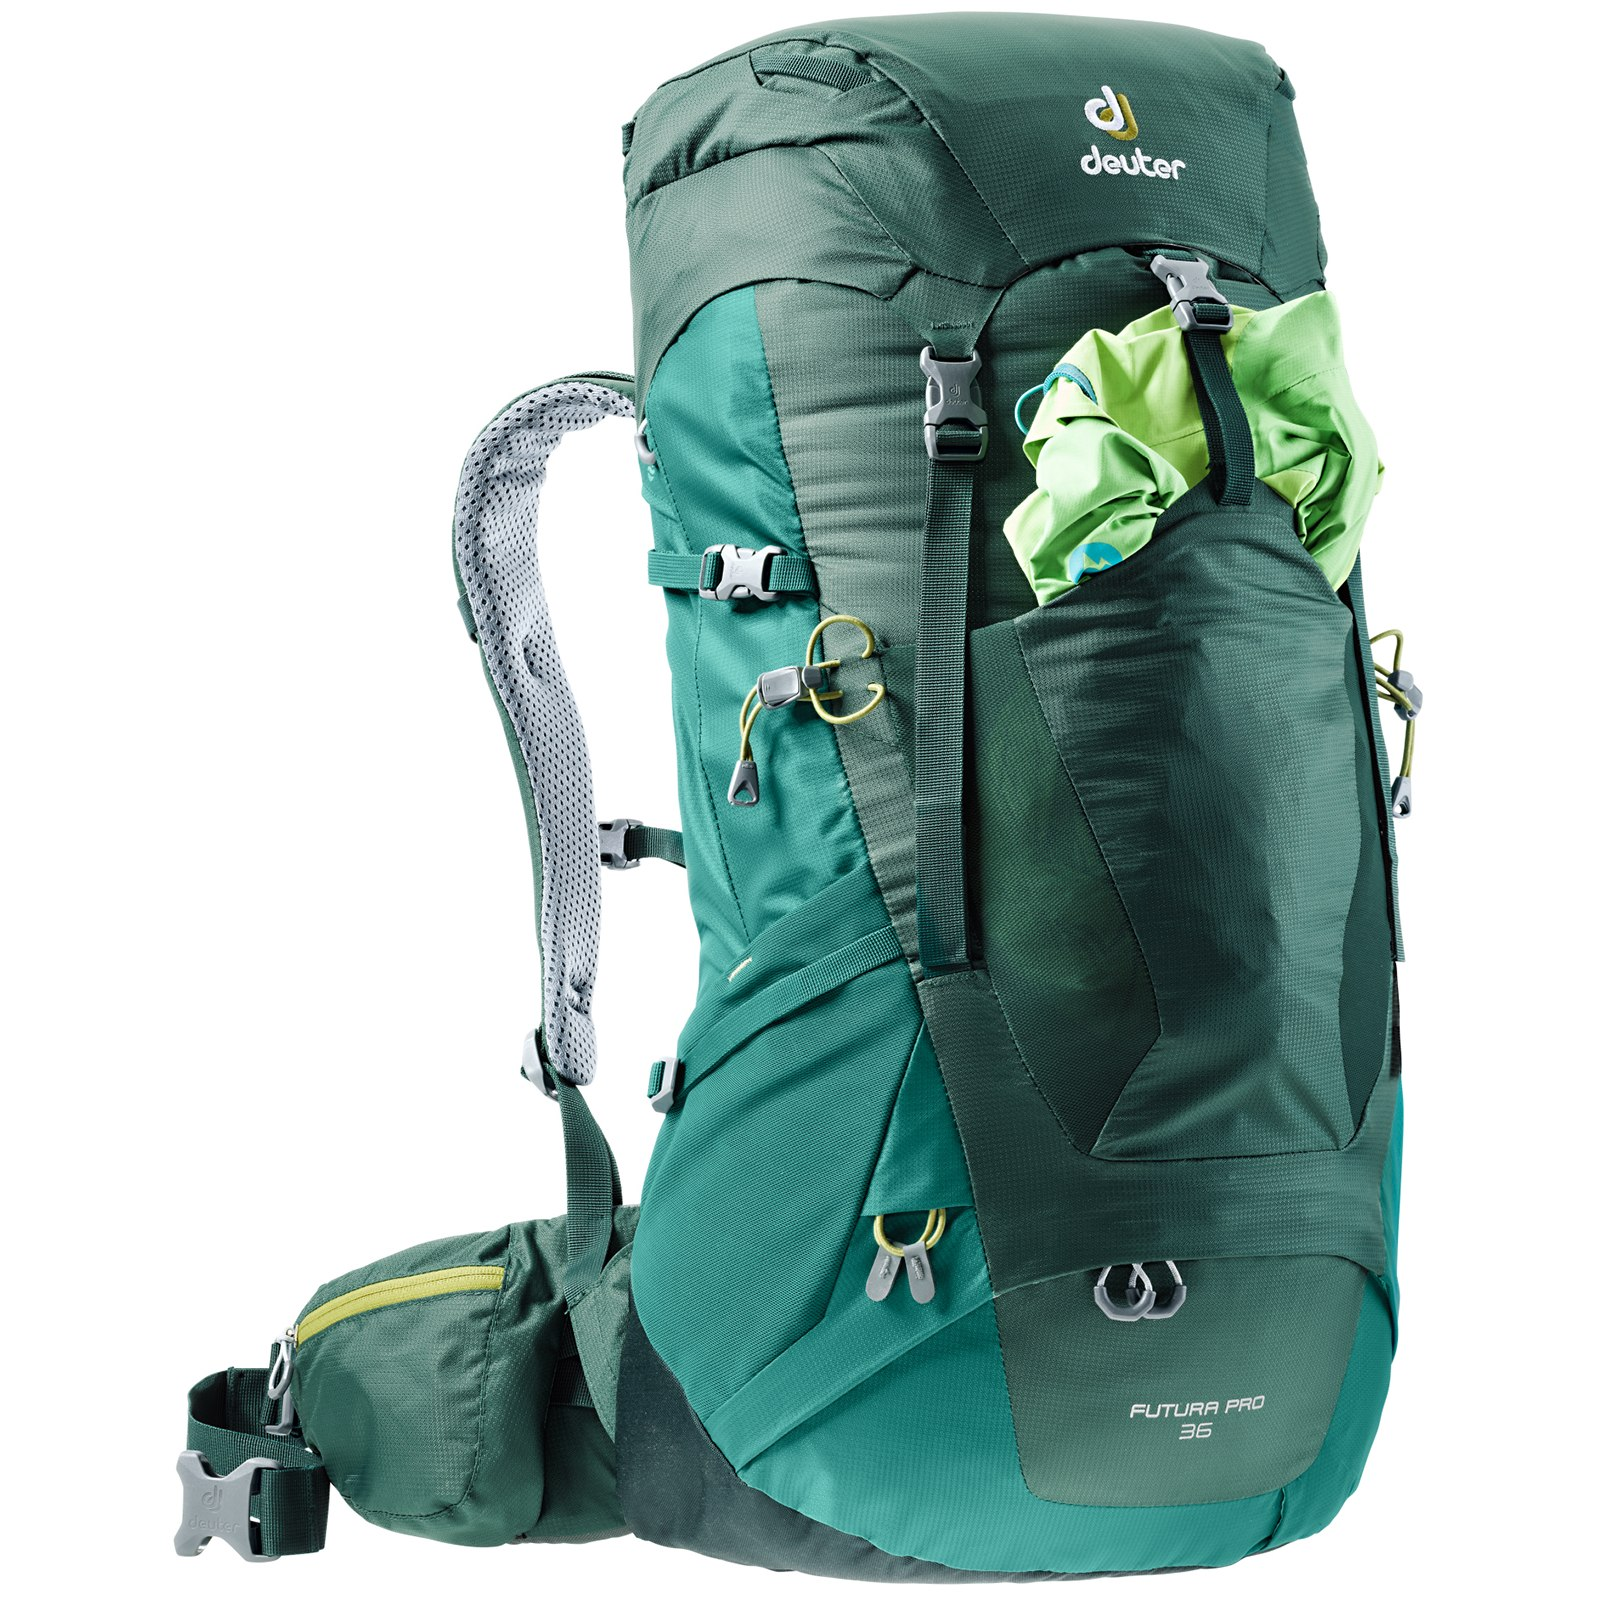 Deuter Futura PRO 40 Hiking Backpack